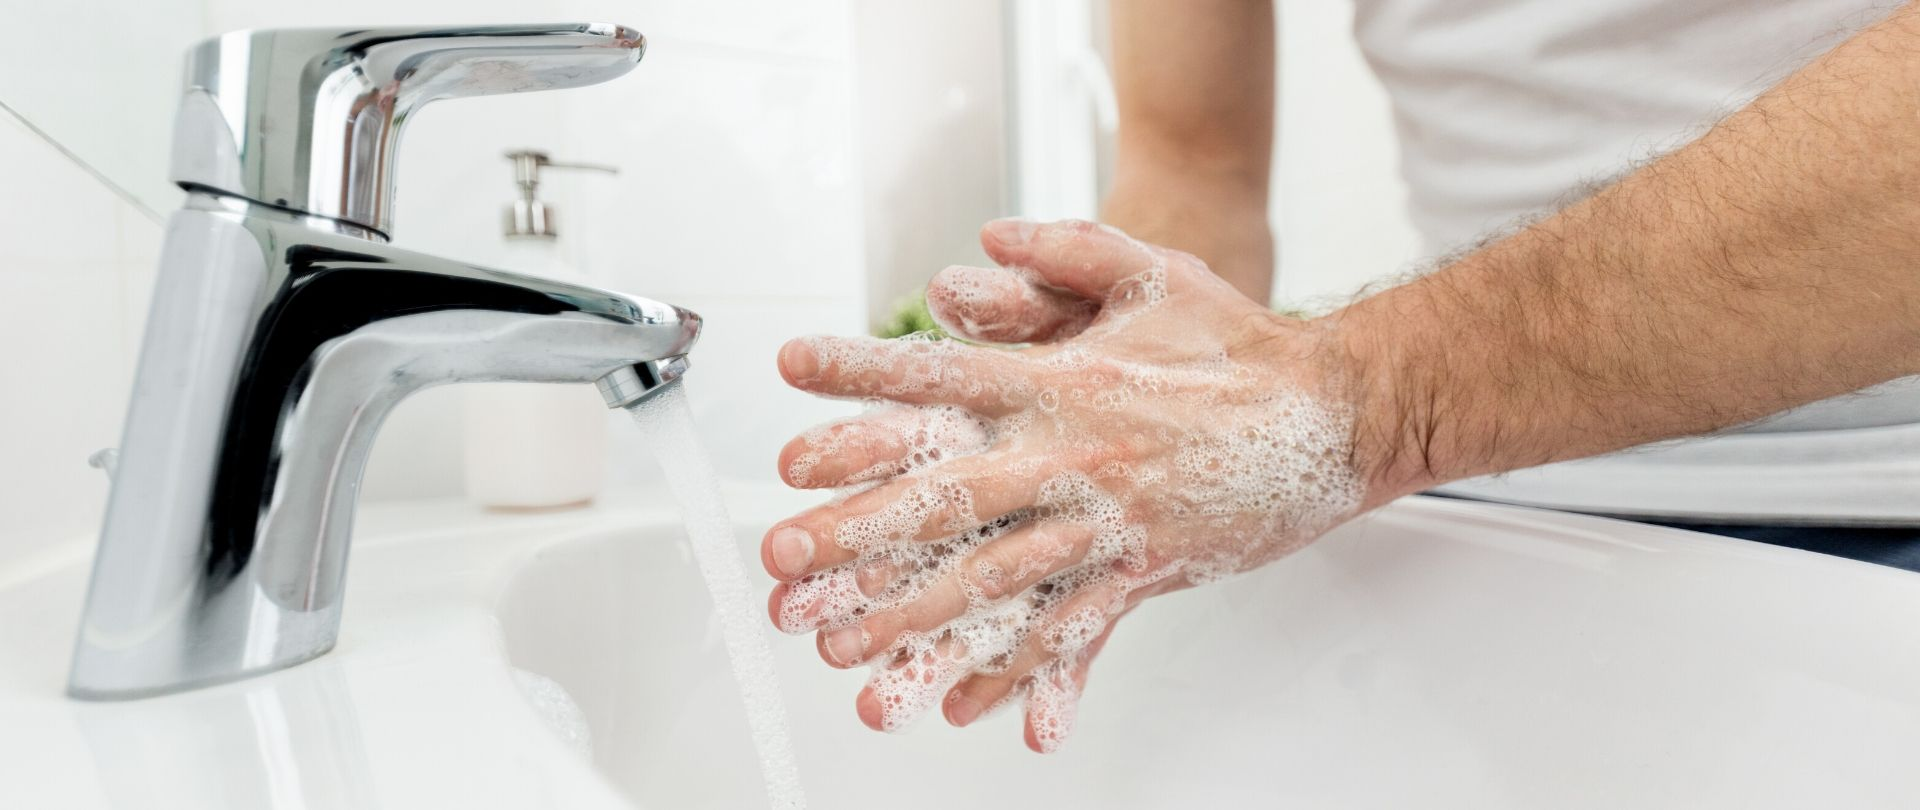 Wash Hands 1920x810 1 - COVID-19